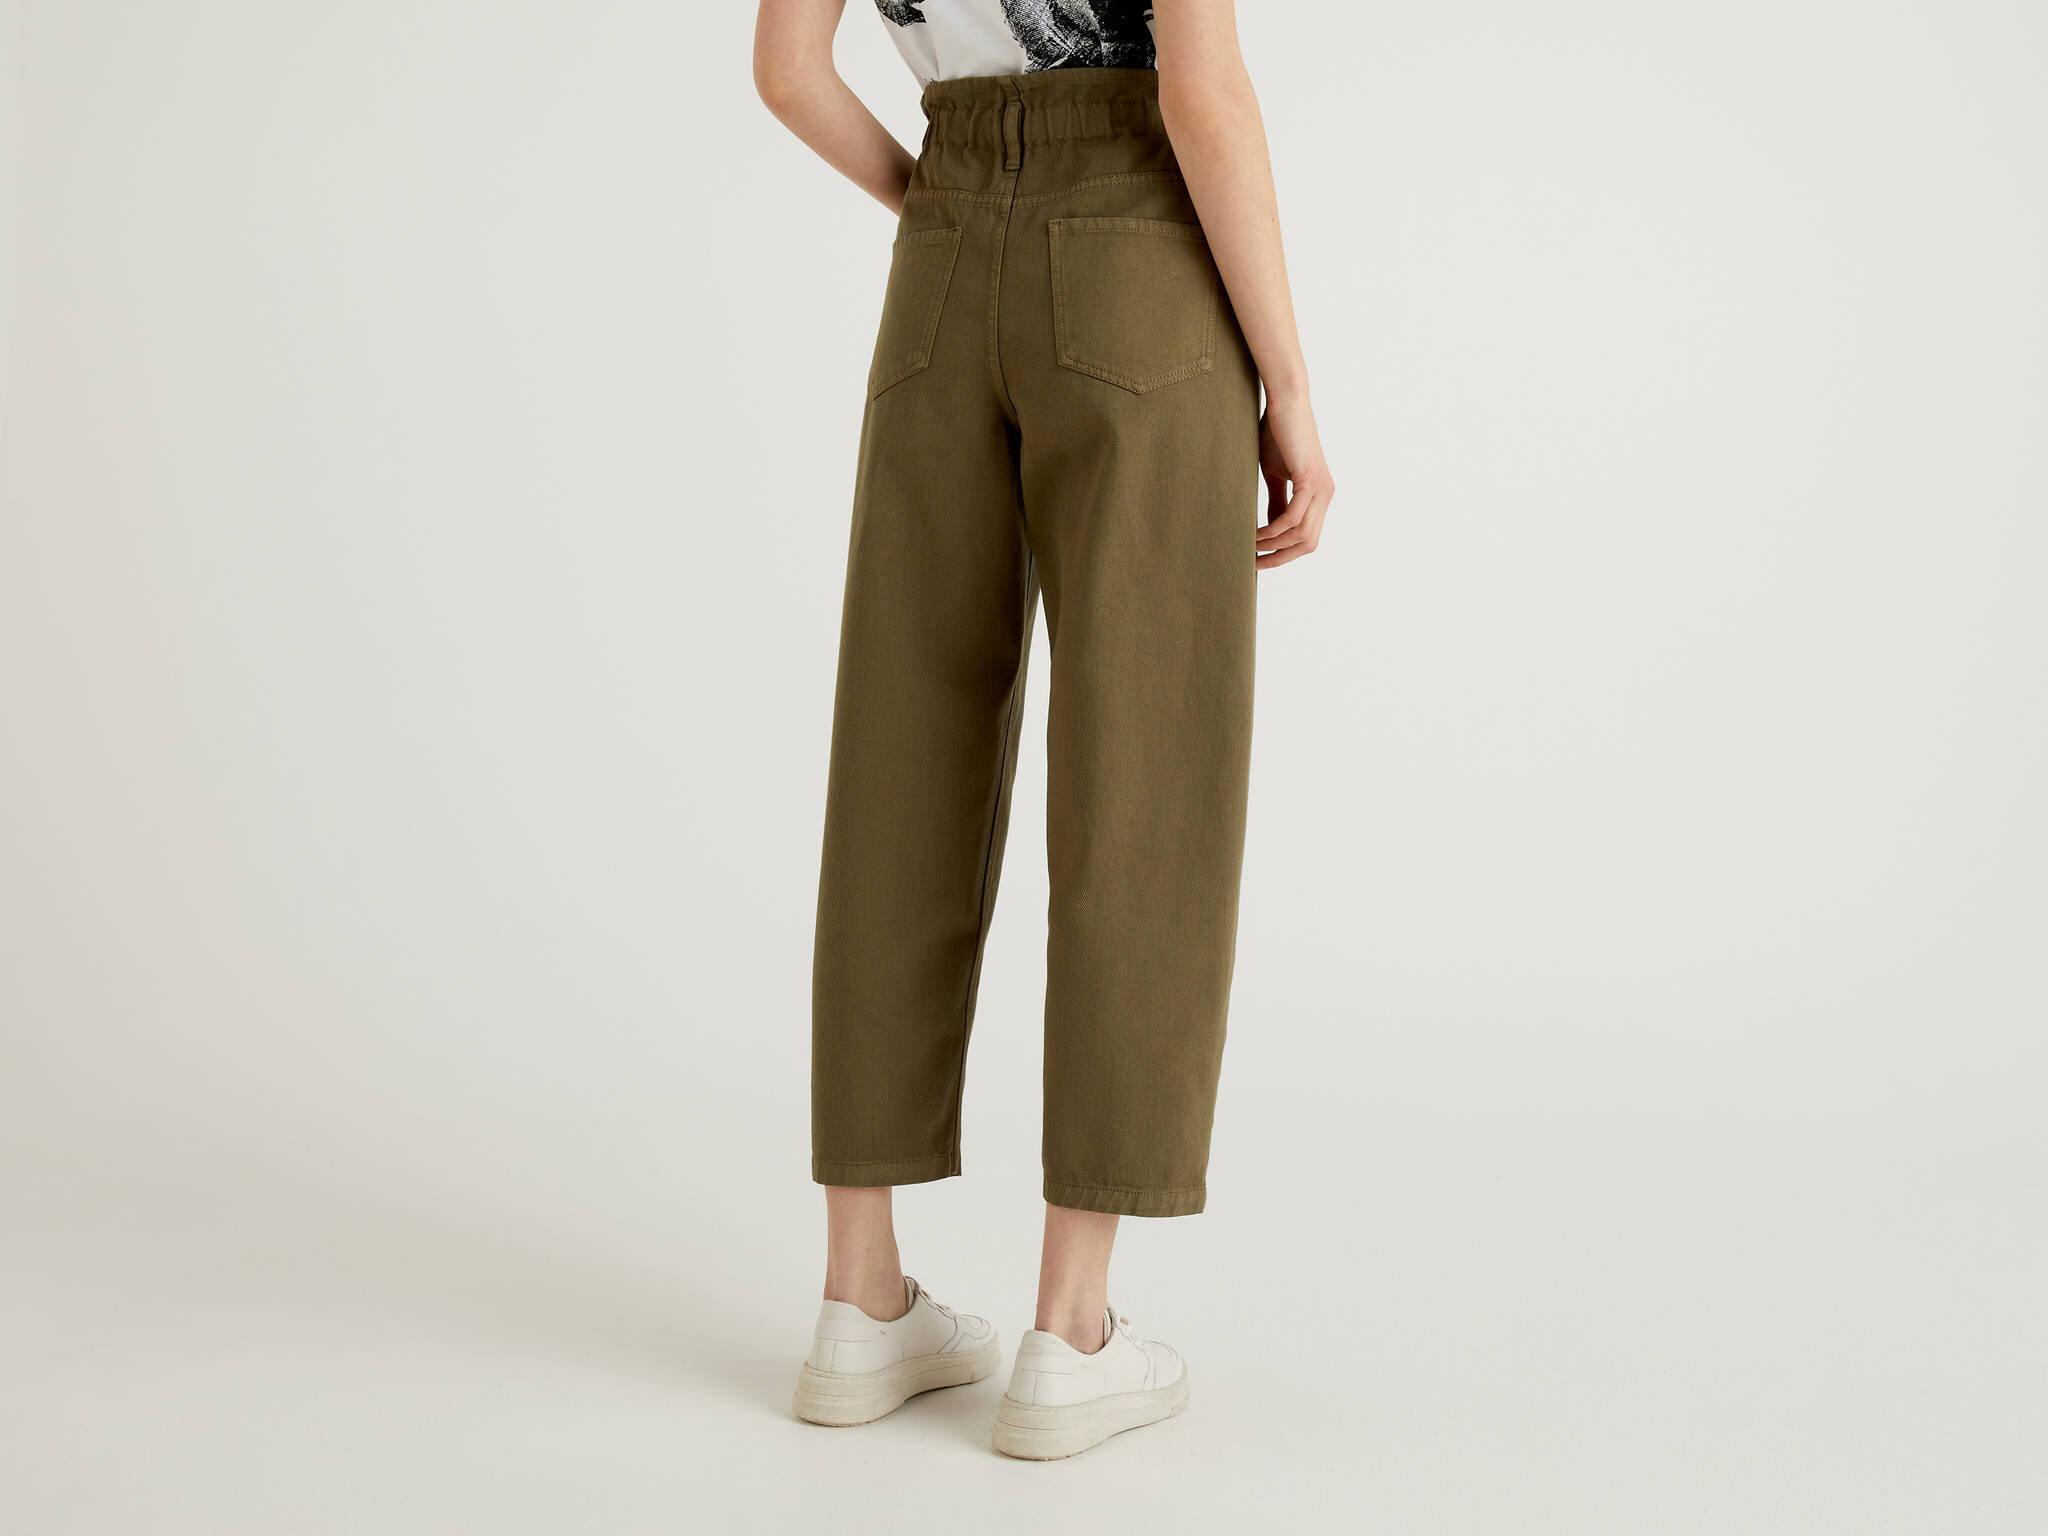 Paperbag Pantolon